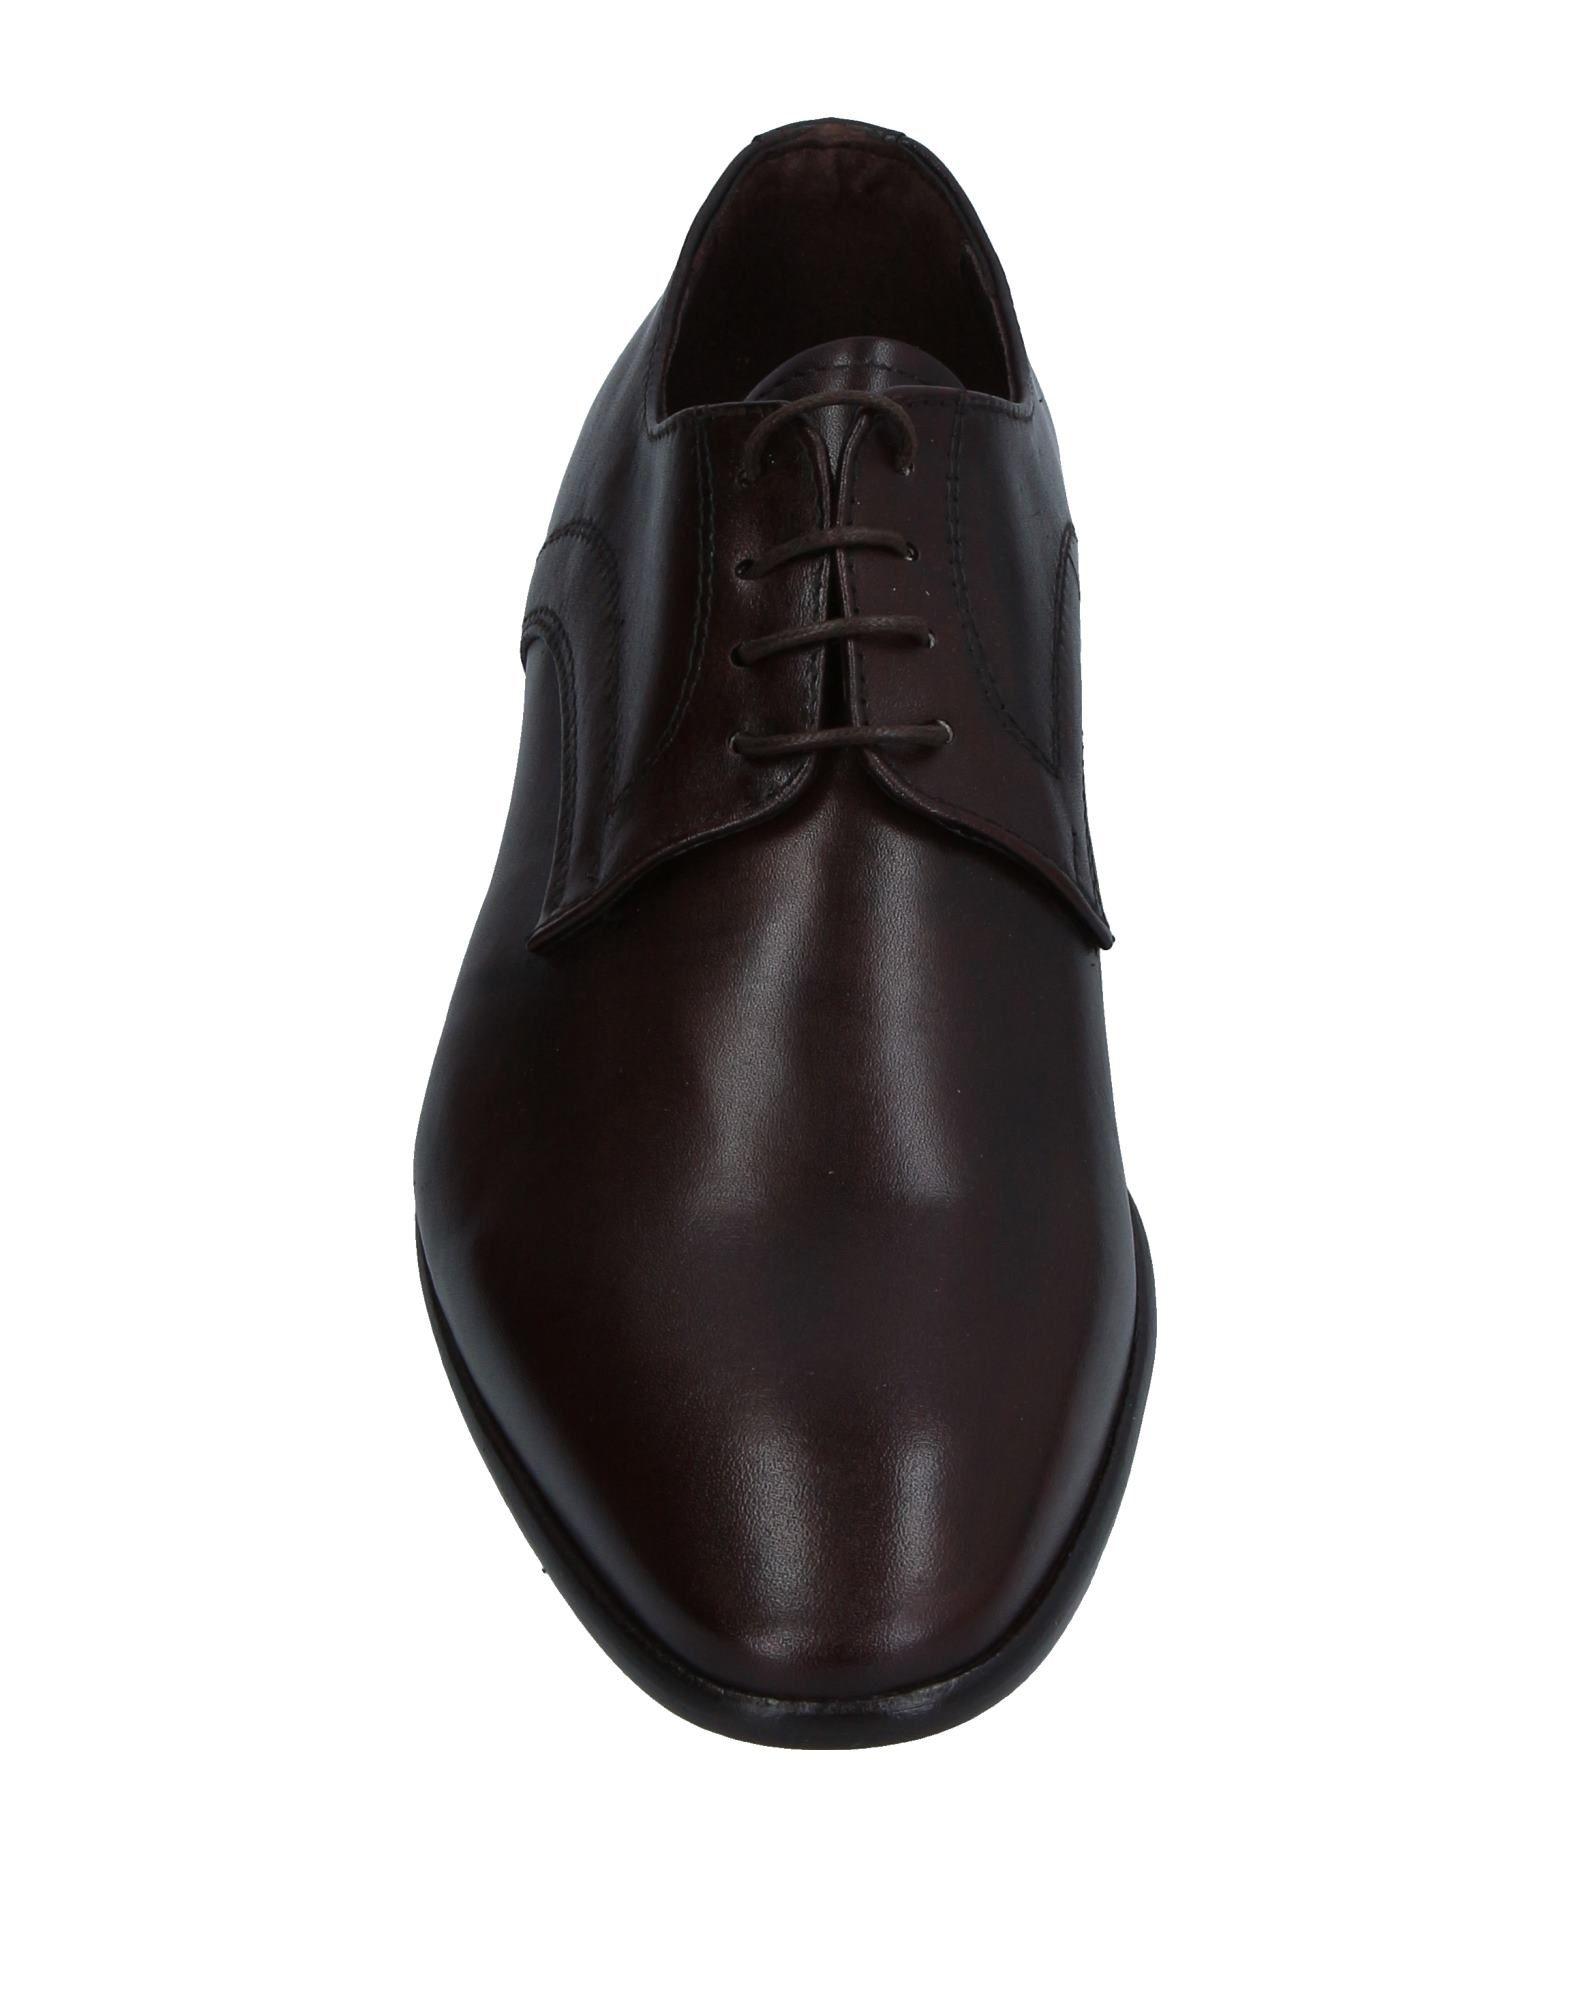 Brawn's Schnürschuhe Schuhe Herren  11291593FK Heiße Schuhe Schnürschuhe 80d463